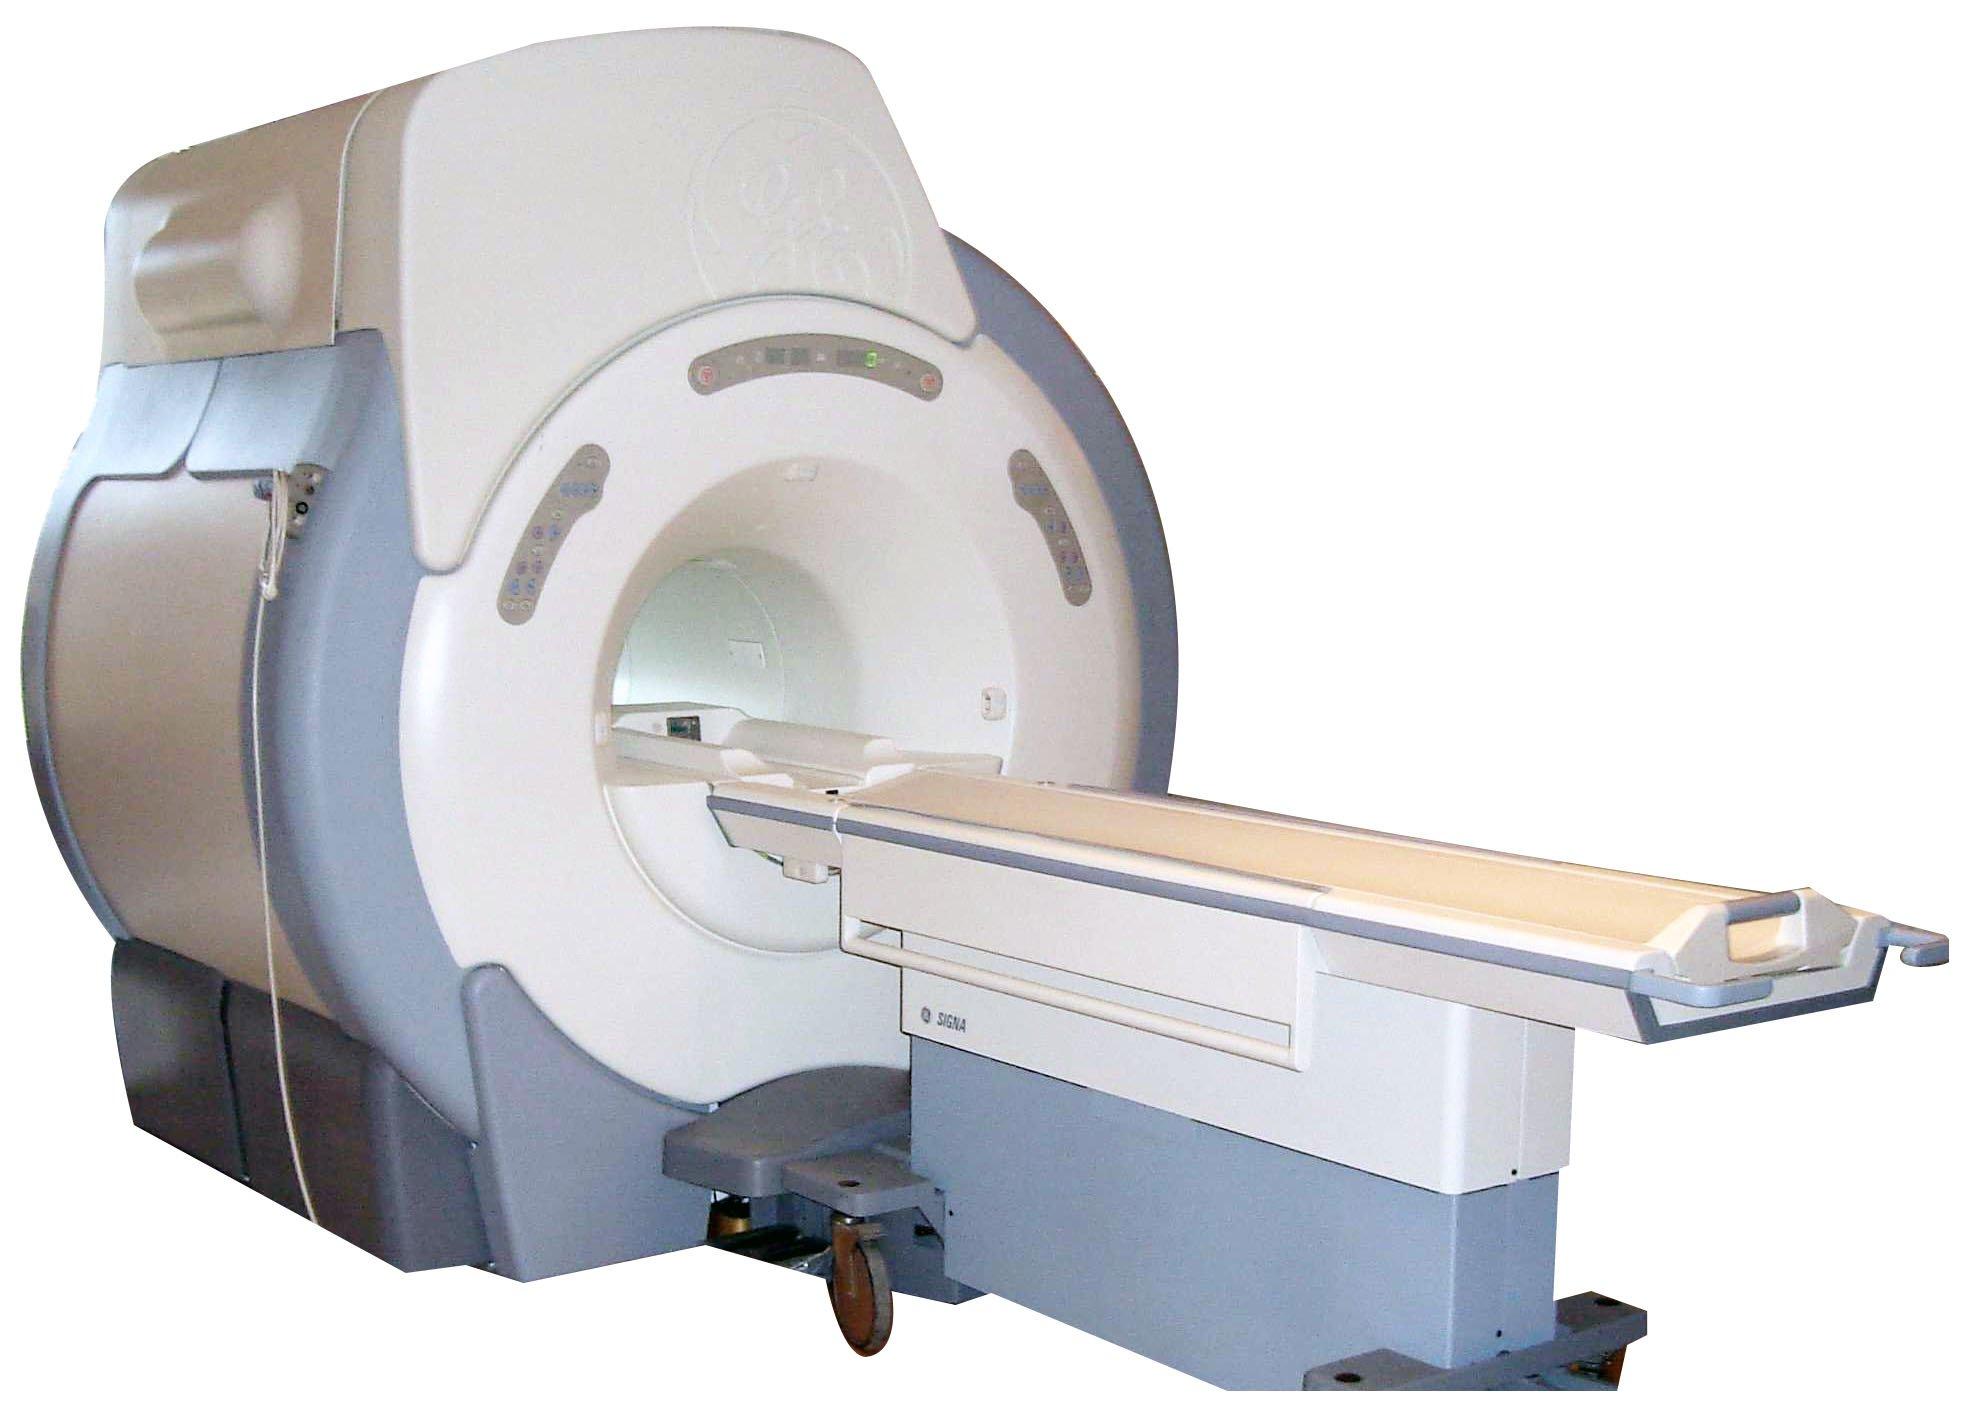 GE MRI Scanner Cost Price Info [2017 Update]